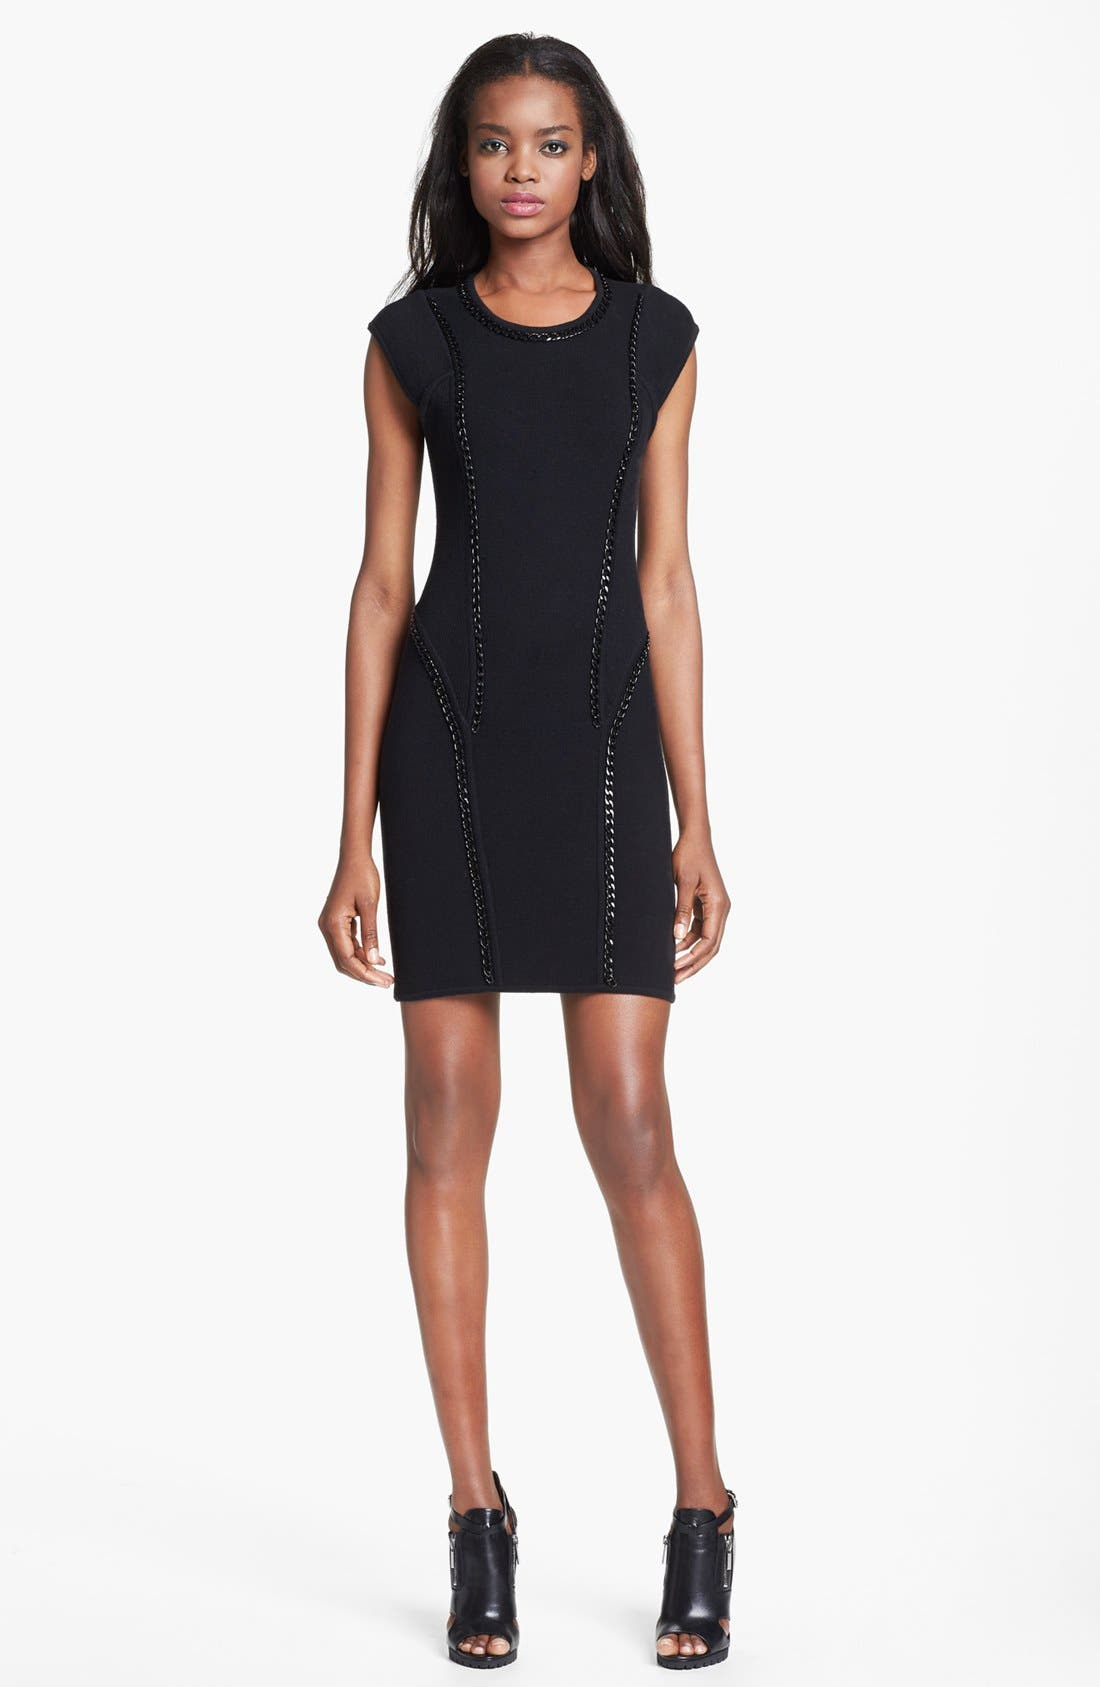 Main Image - Milly 'Ditta' Chain Detail Merino Wool & Cotton Body-Con Dress